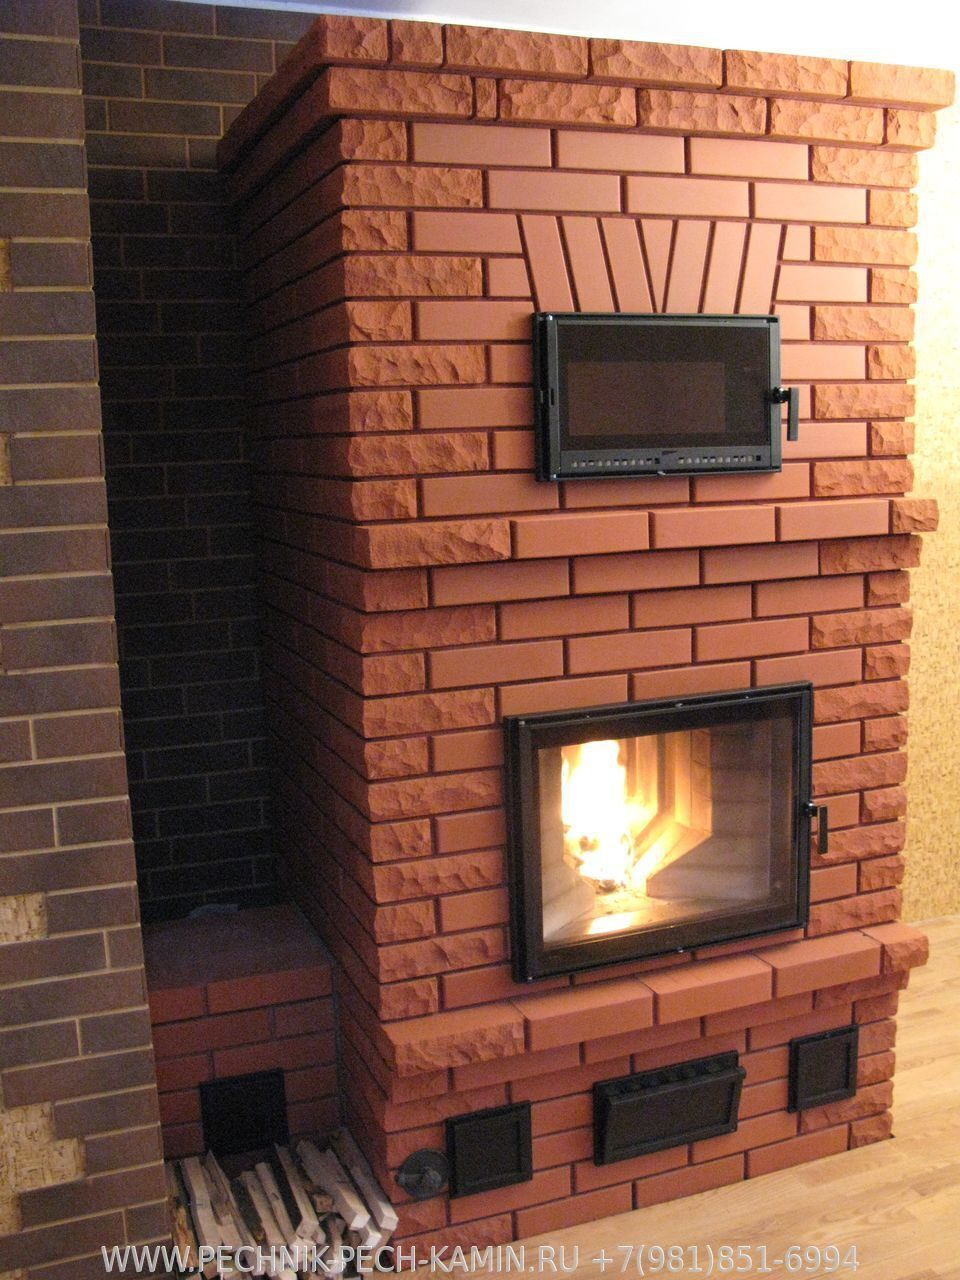 Камин-печь для дома из кирпича своими руками фото 61